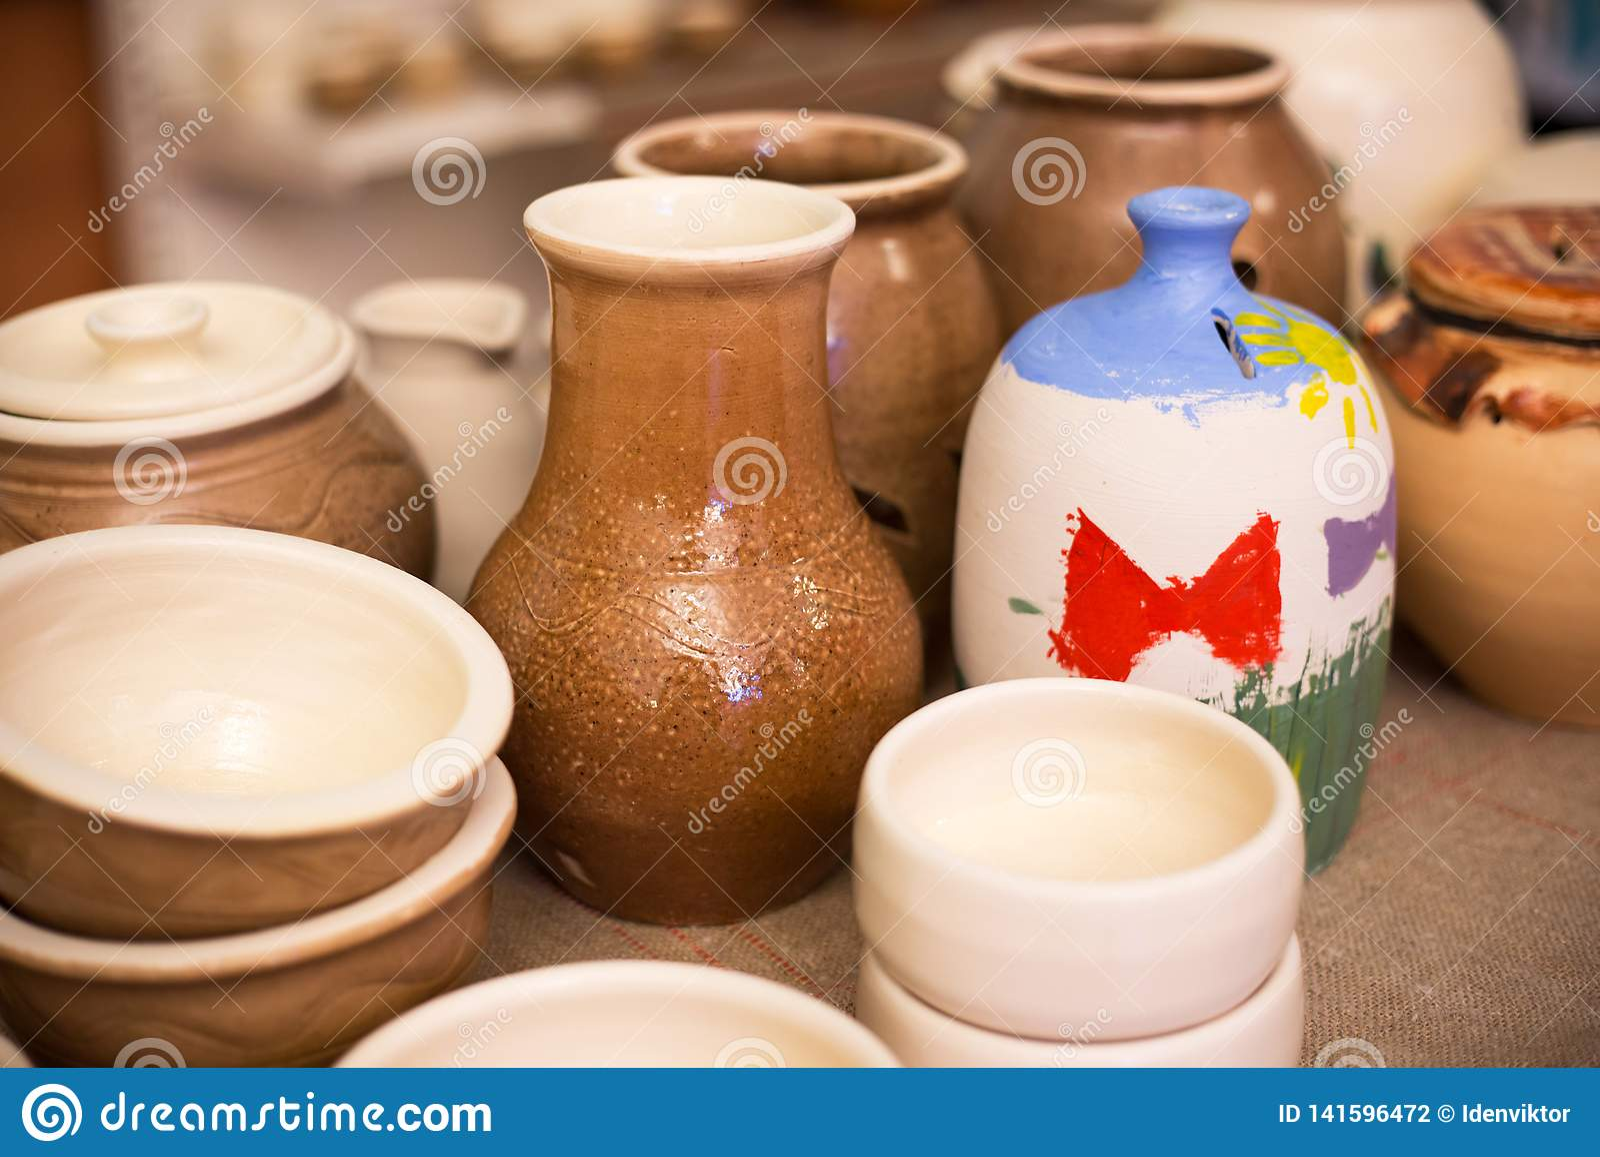 Handmade Pottery Ceramic Clay Pots Jug And Cups Stock Photo Image Of Vase Handicraft 141596472